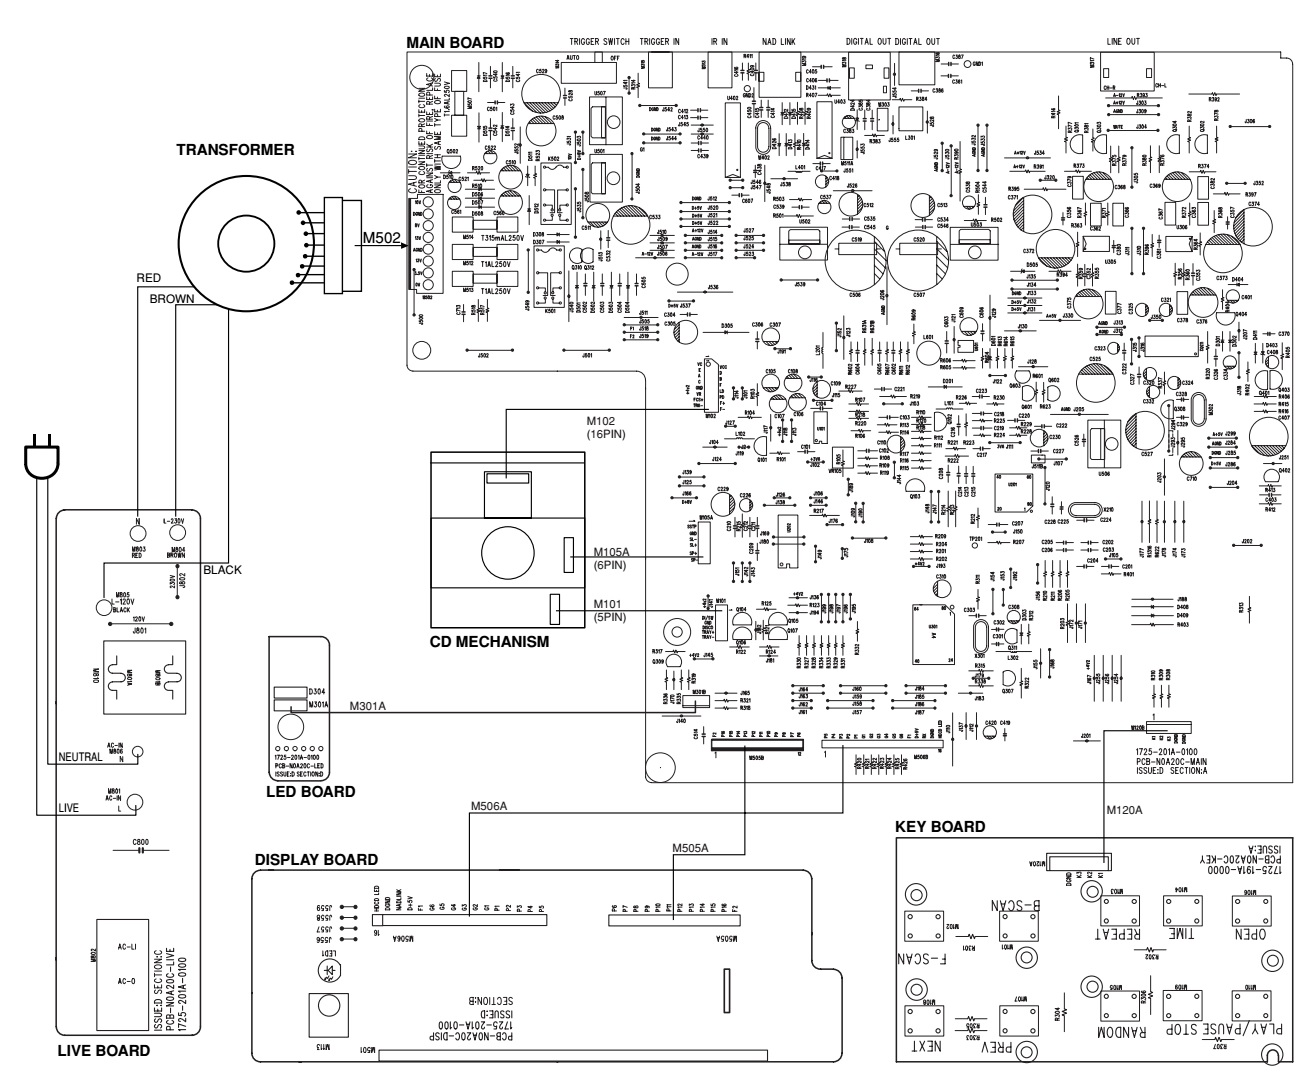 static can ruin a circuit board